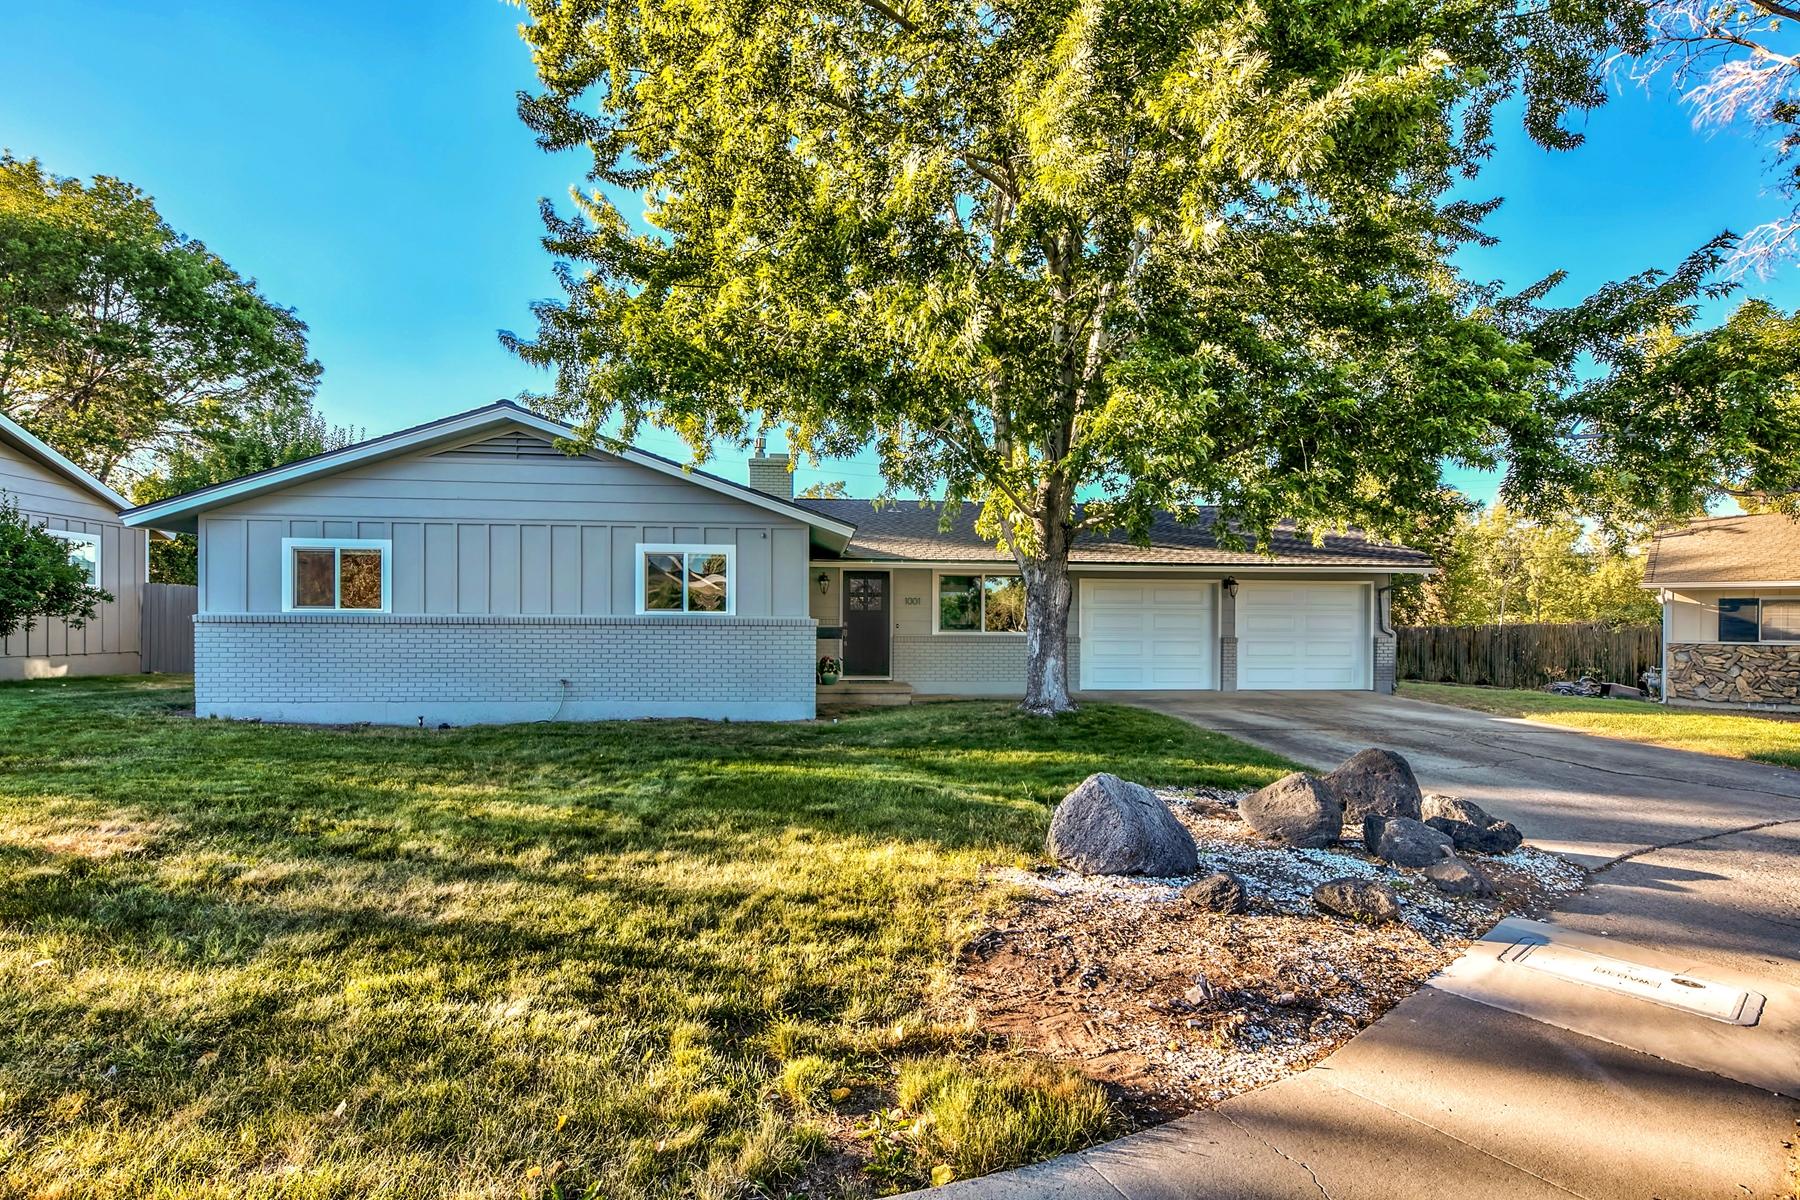 Property 为 销售 在 1001 Golconda Drive, Reno, Nevada 1001 Golconda Dr. 里诺, 内华达州 89509 美国